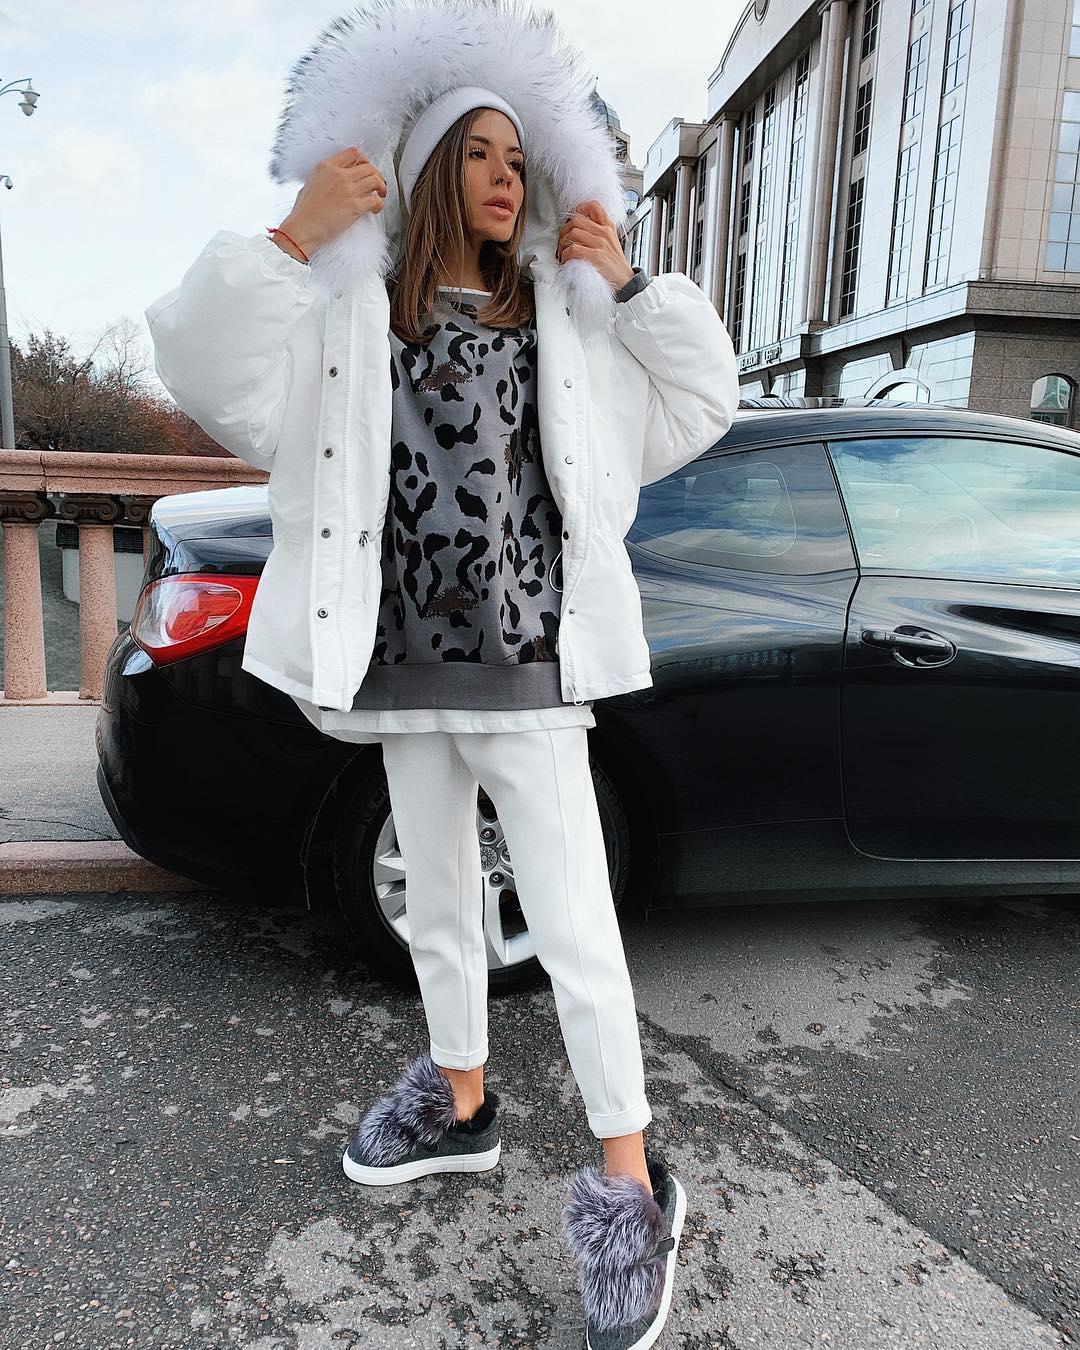 Уличный стиль (street style) зимы 2019 фото 13